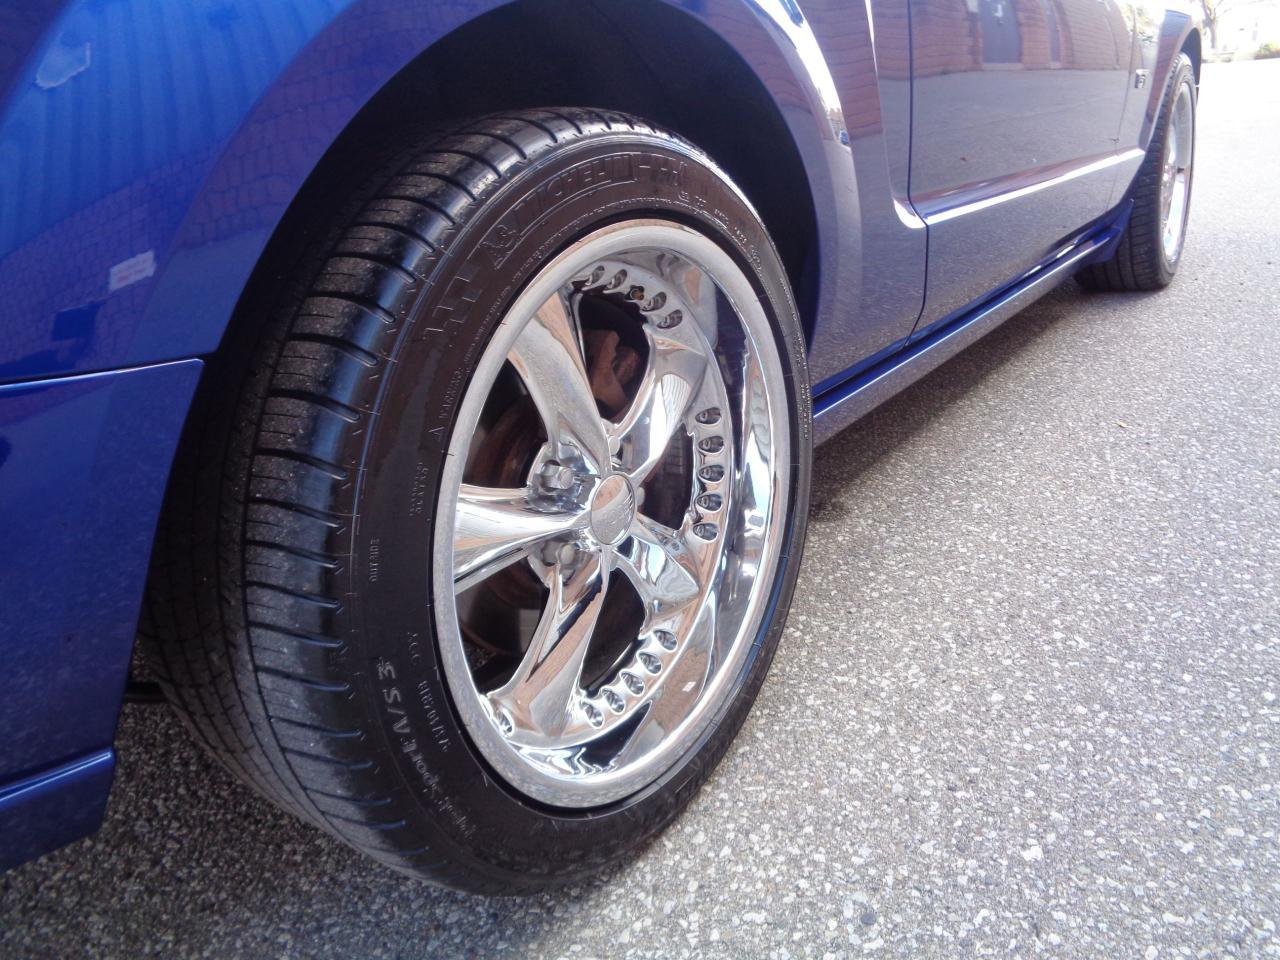 2005 Ford Mustang GT - MANUAL - FOOSE WHEELS - ROUSH SHIFTER